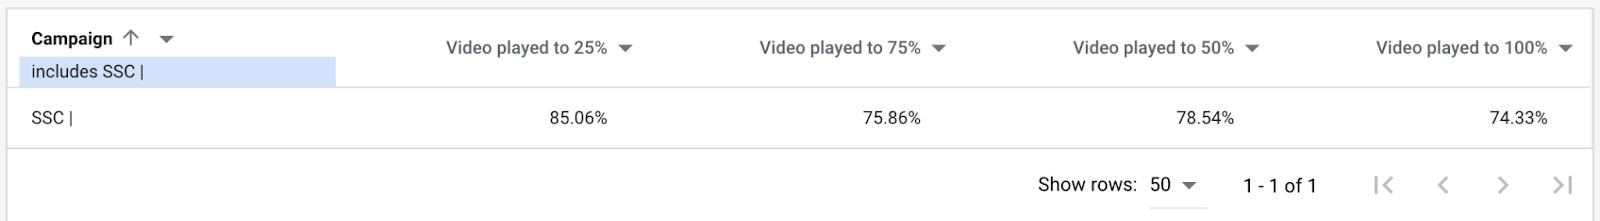 Google smart shopping YouTube reporting